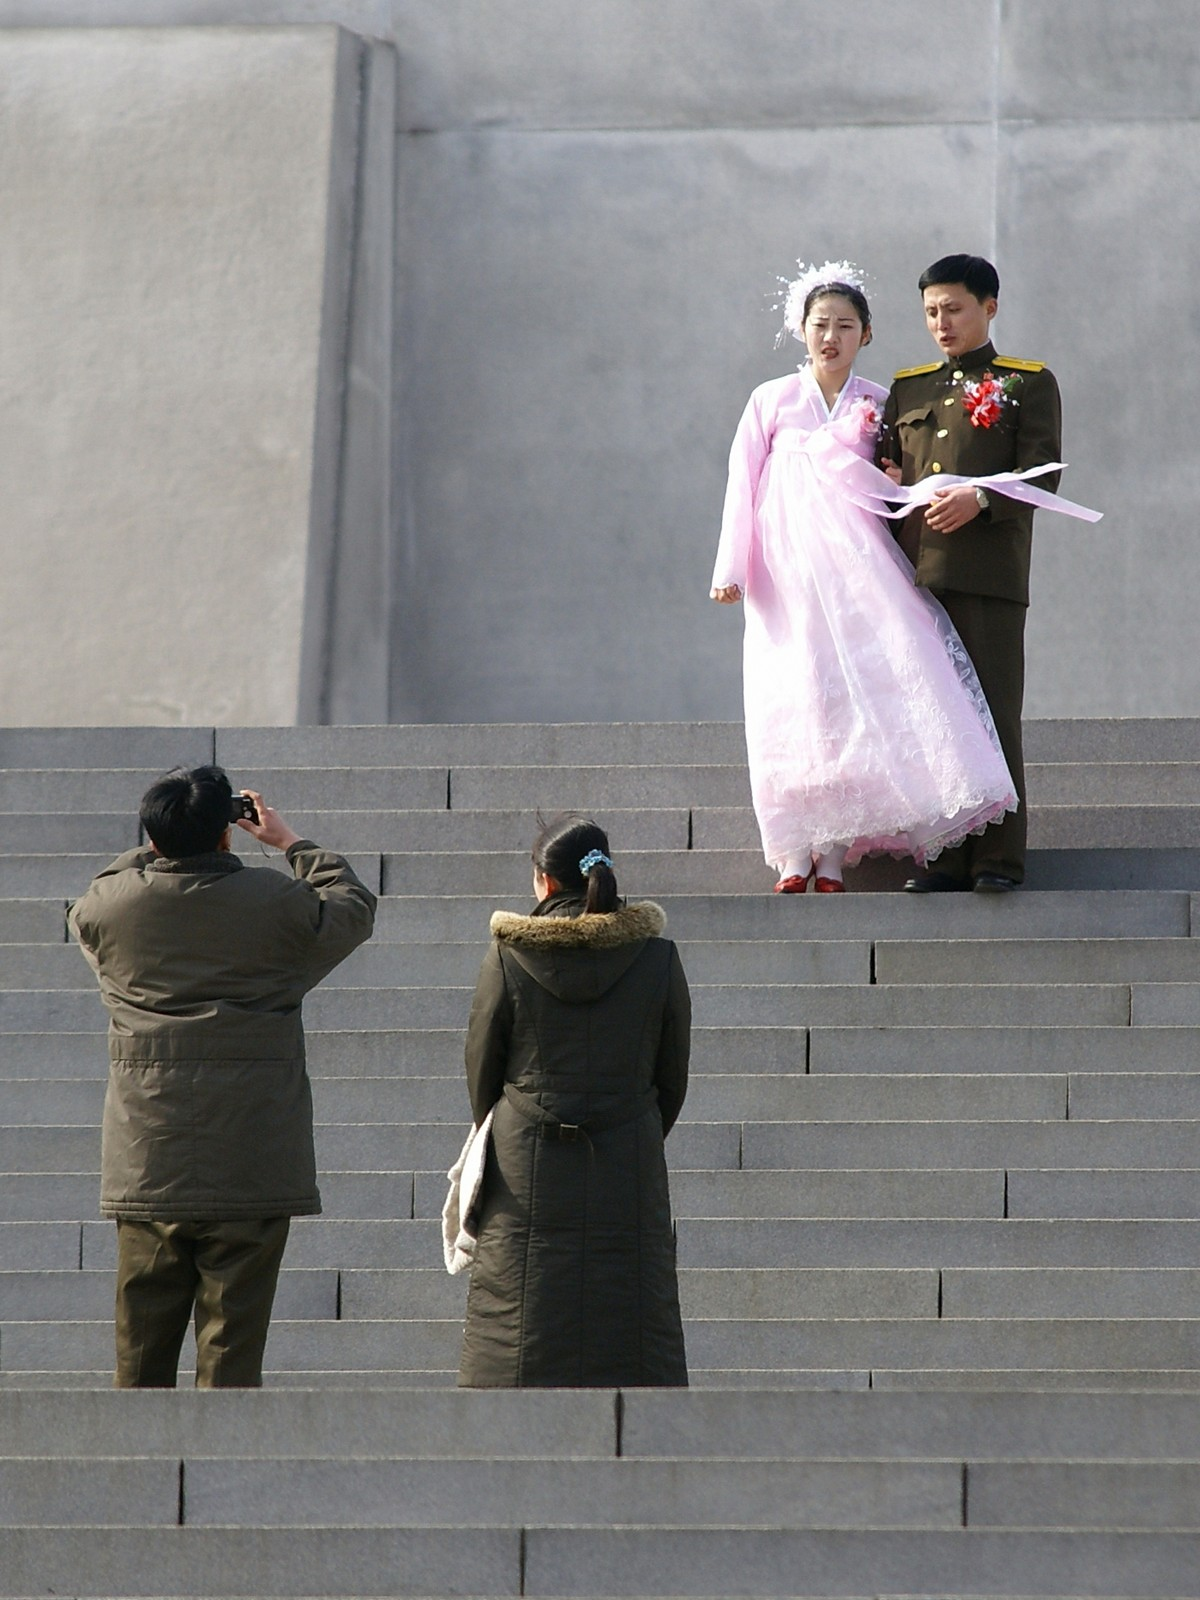 Taking wedding photos